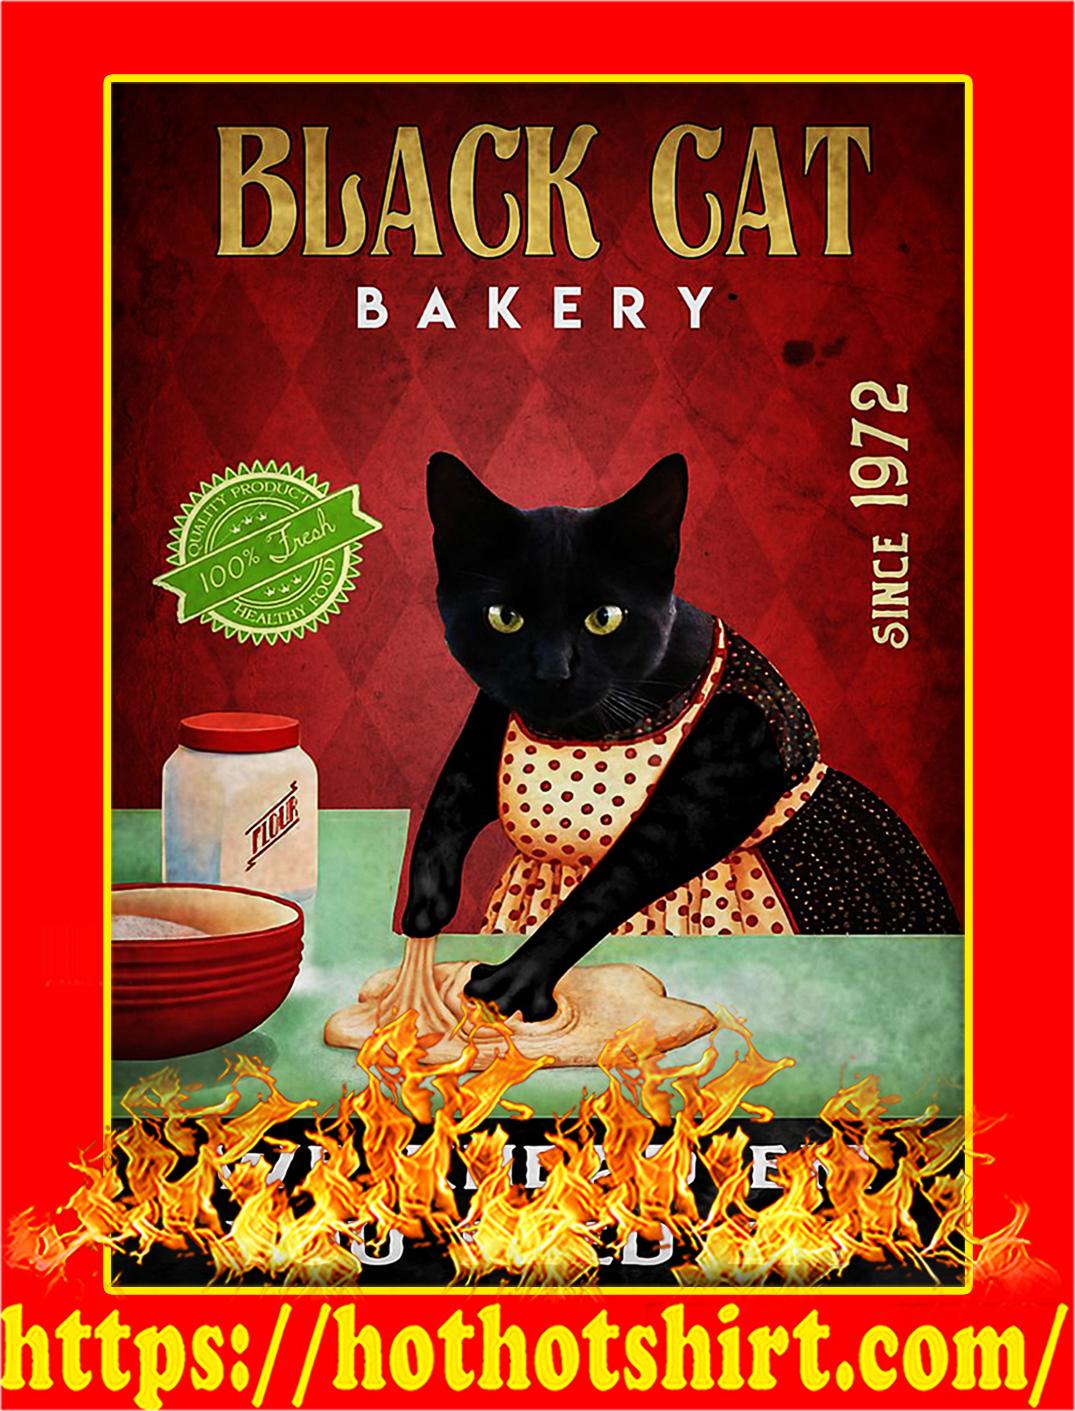 Black cat bakery we knead em you need em poster - A1